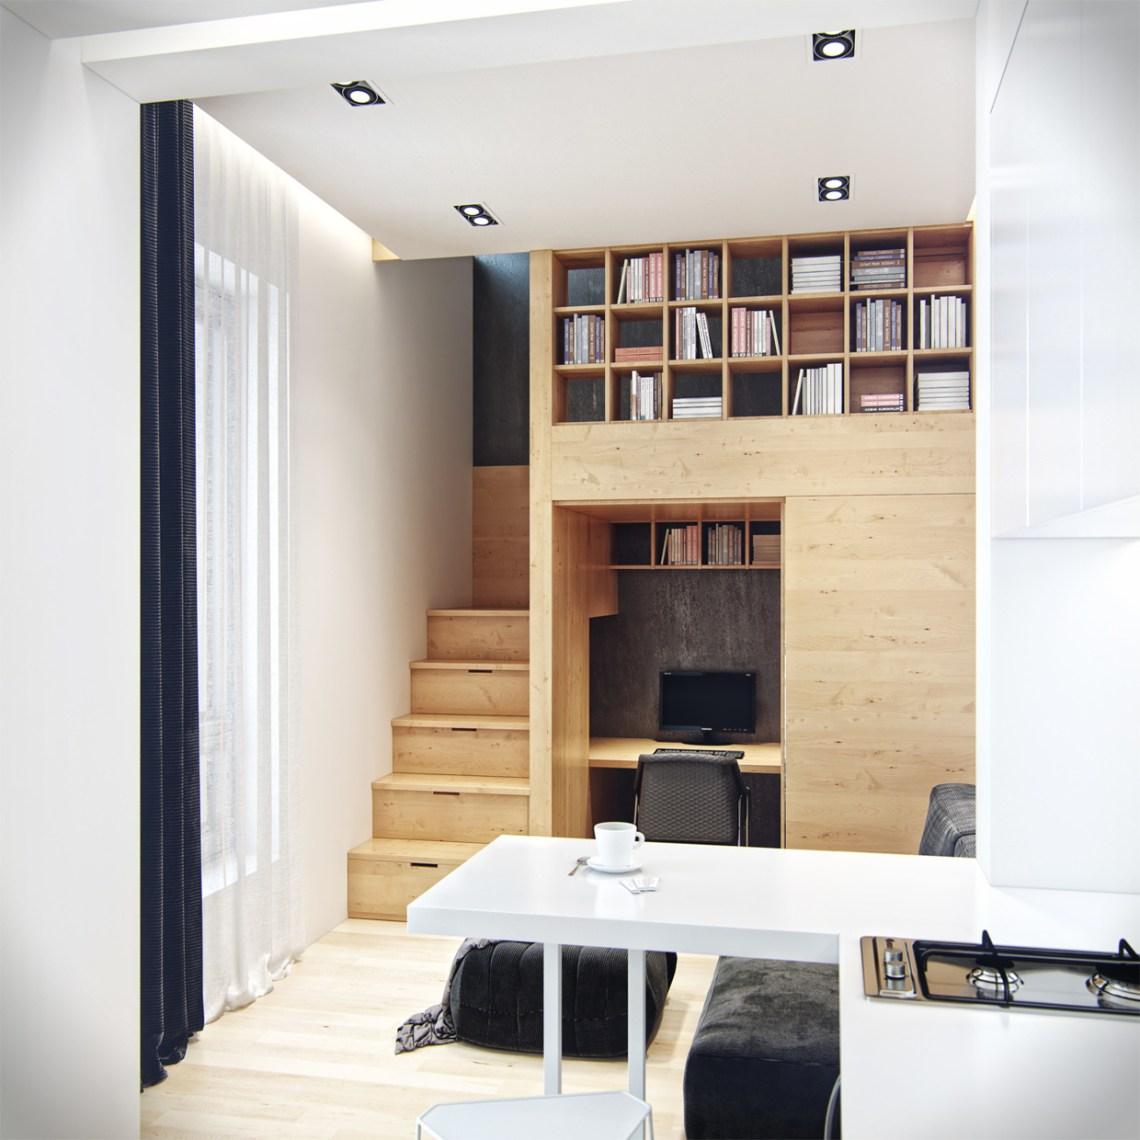 Image Result For Interior Design Simulator Online